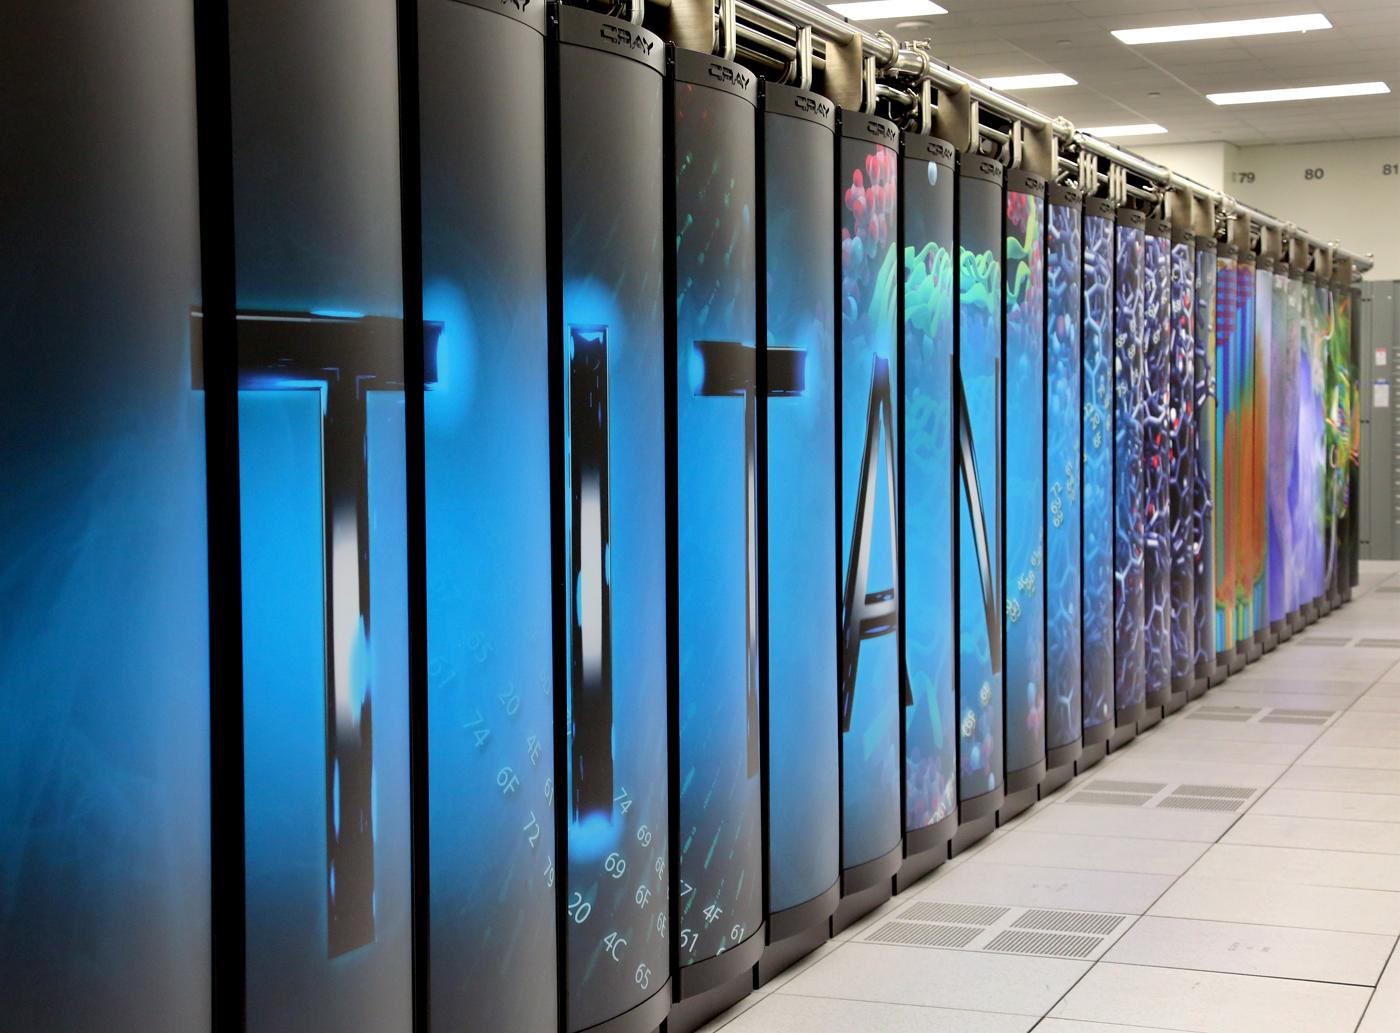 Media asset in full size related to 3dfxzone.it news item entitled as follows: NVIDIA: le GPU Tesla K20 per il supercomputer più veloce al mondo   Image Name: news18406_NVIDIA-Tesla-K20-GPU_2.jpg